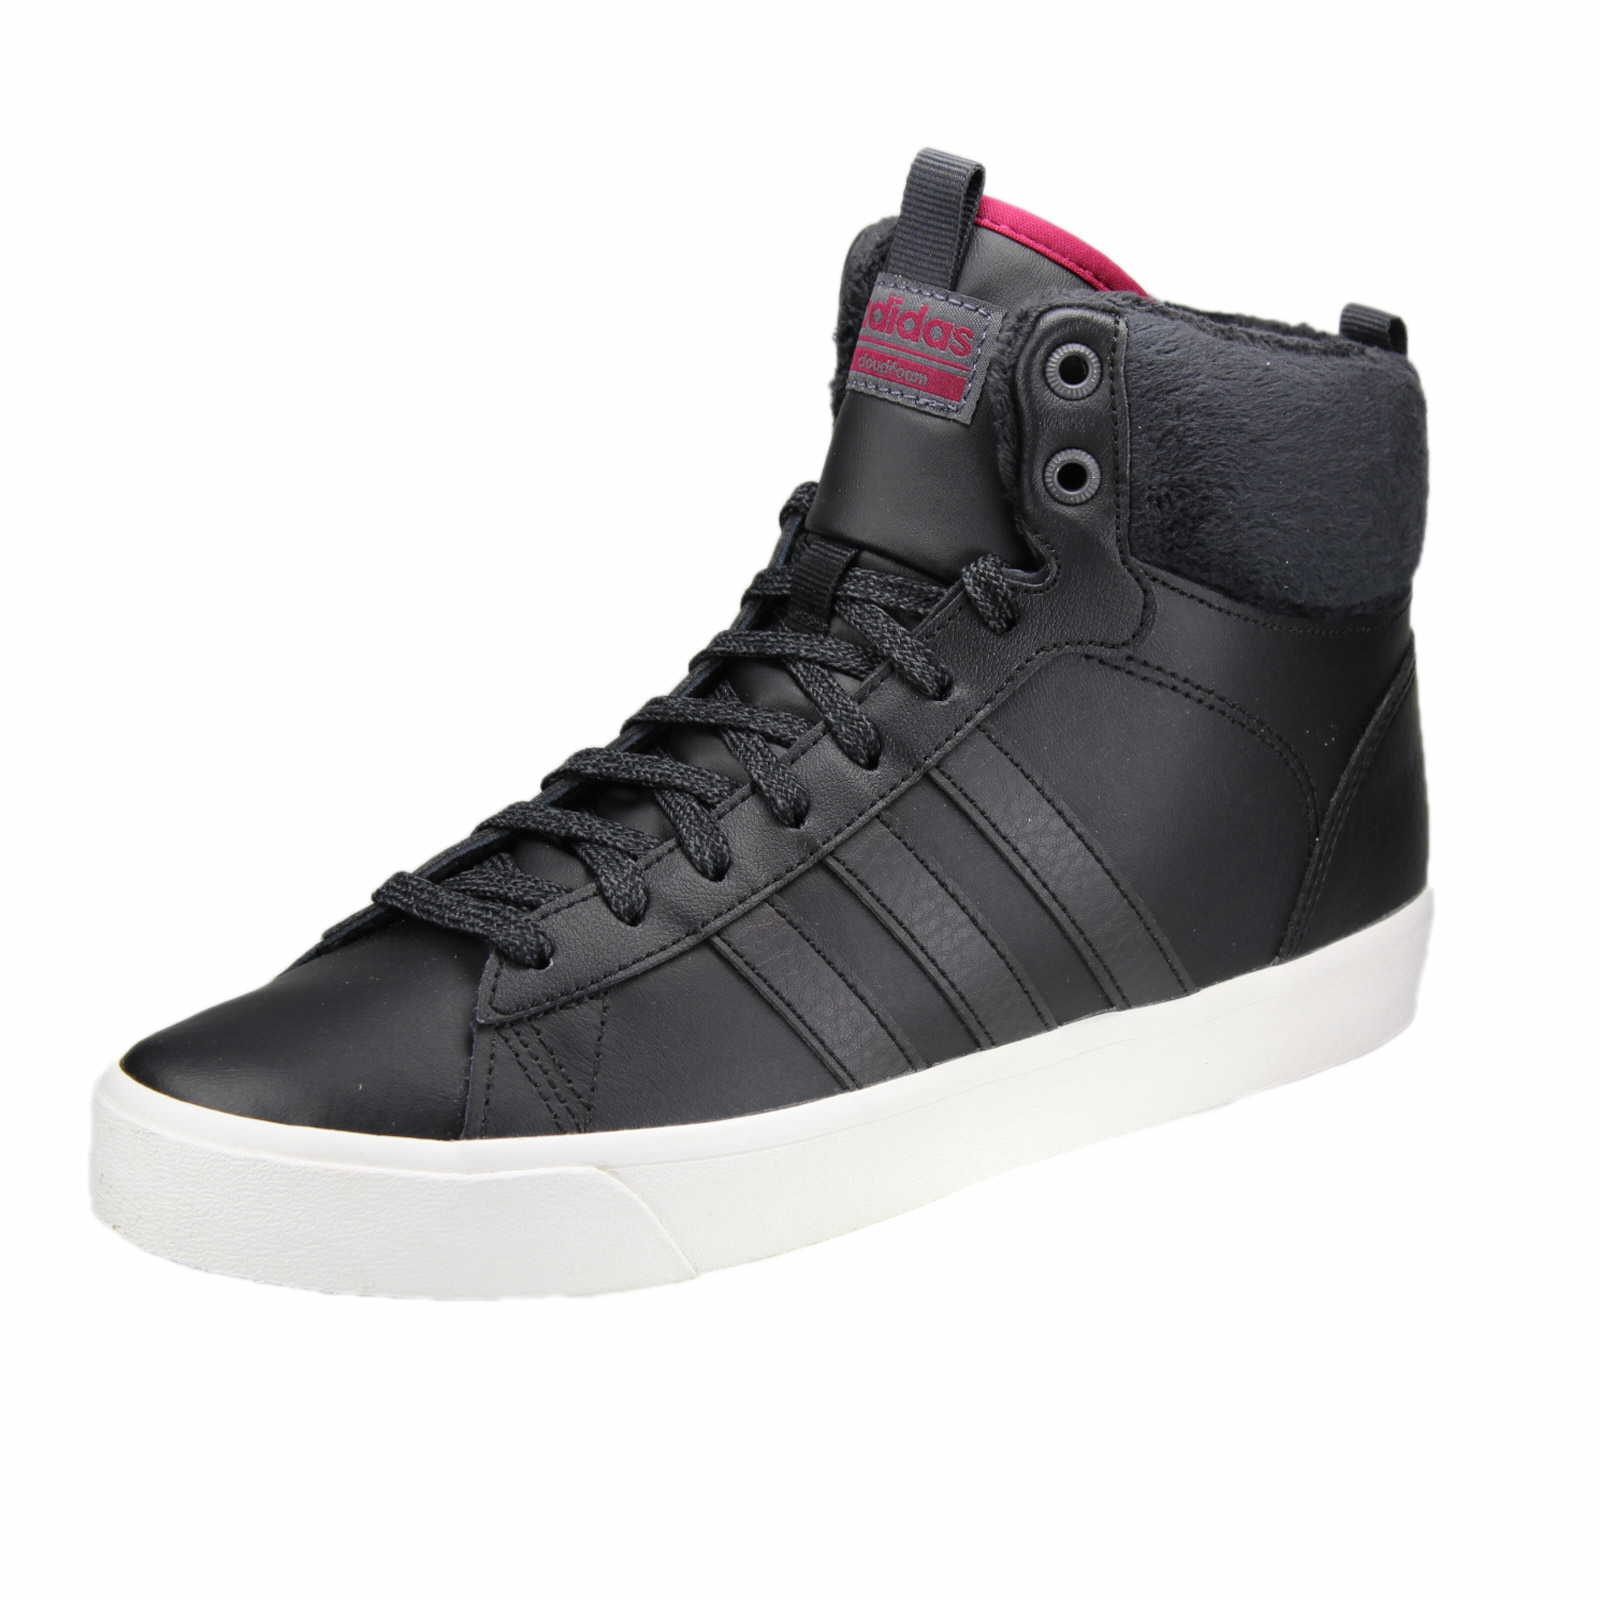 Neo Adidas SchwarzSchuhparadies Sneaker In vnmN08w